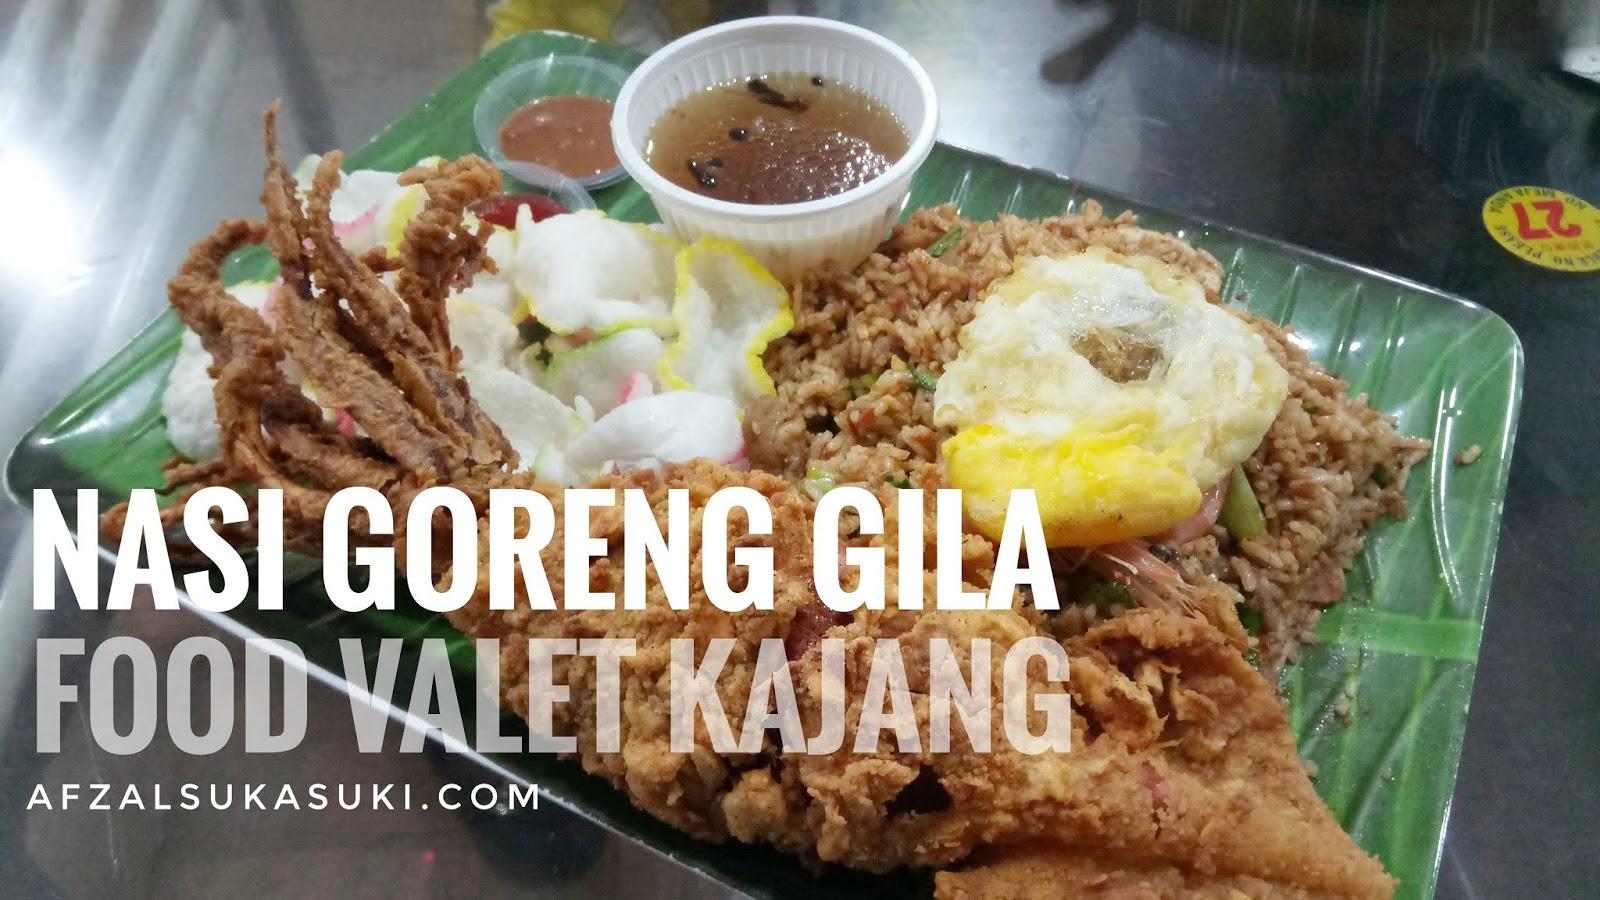 Download Gambar Orang Jual Nasi Goreng